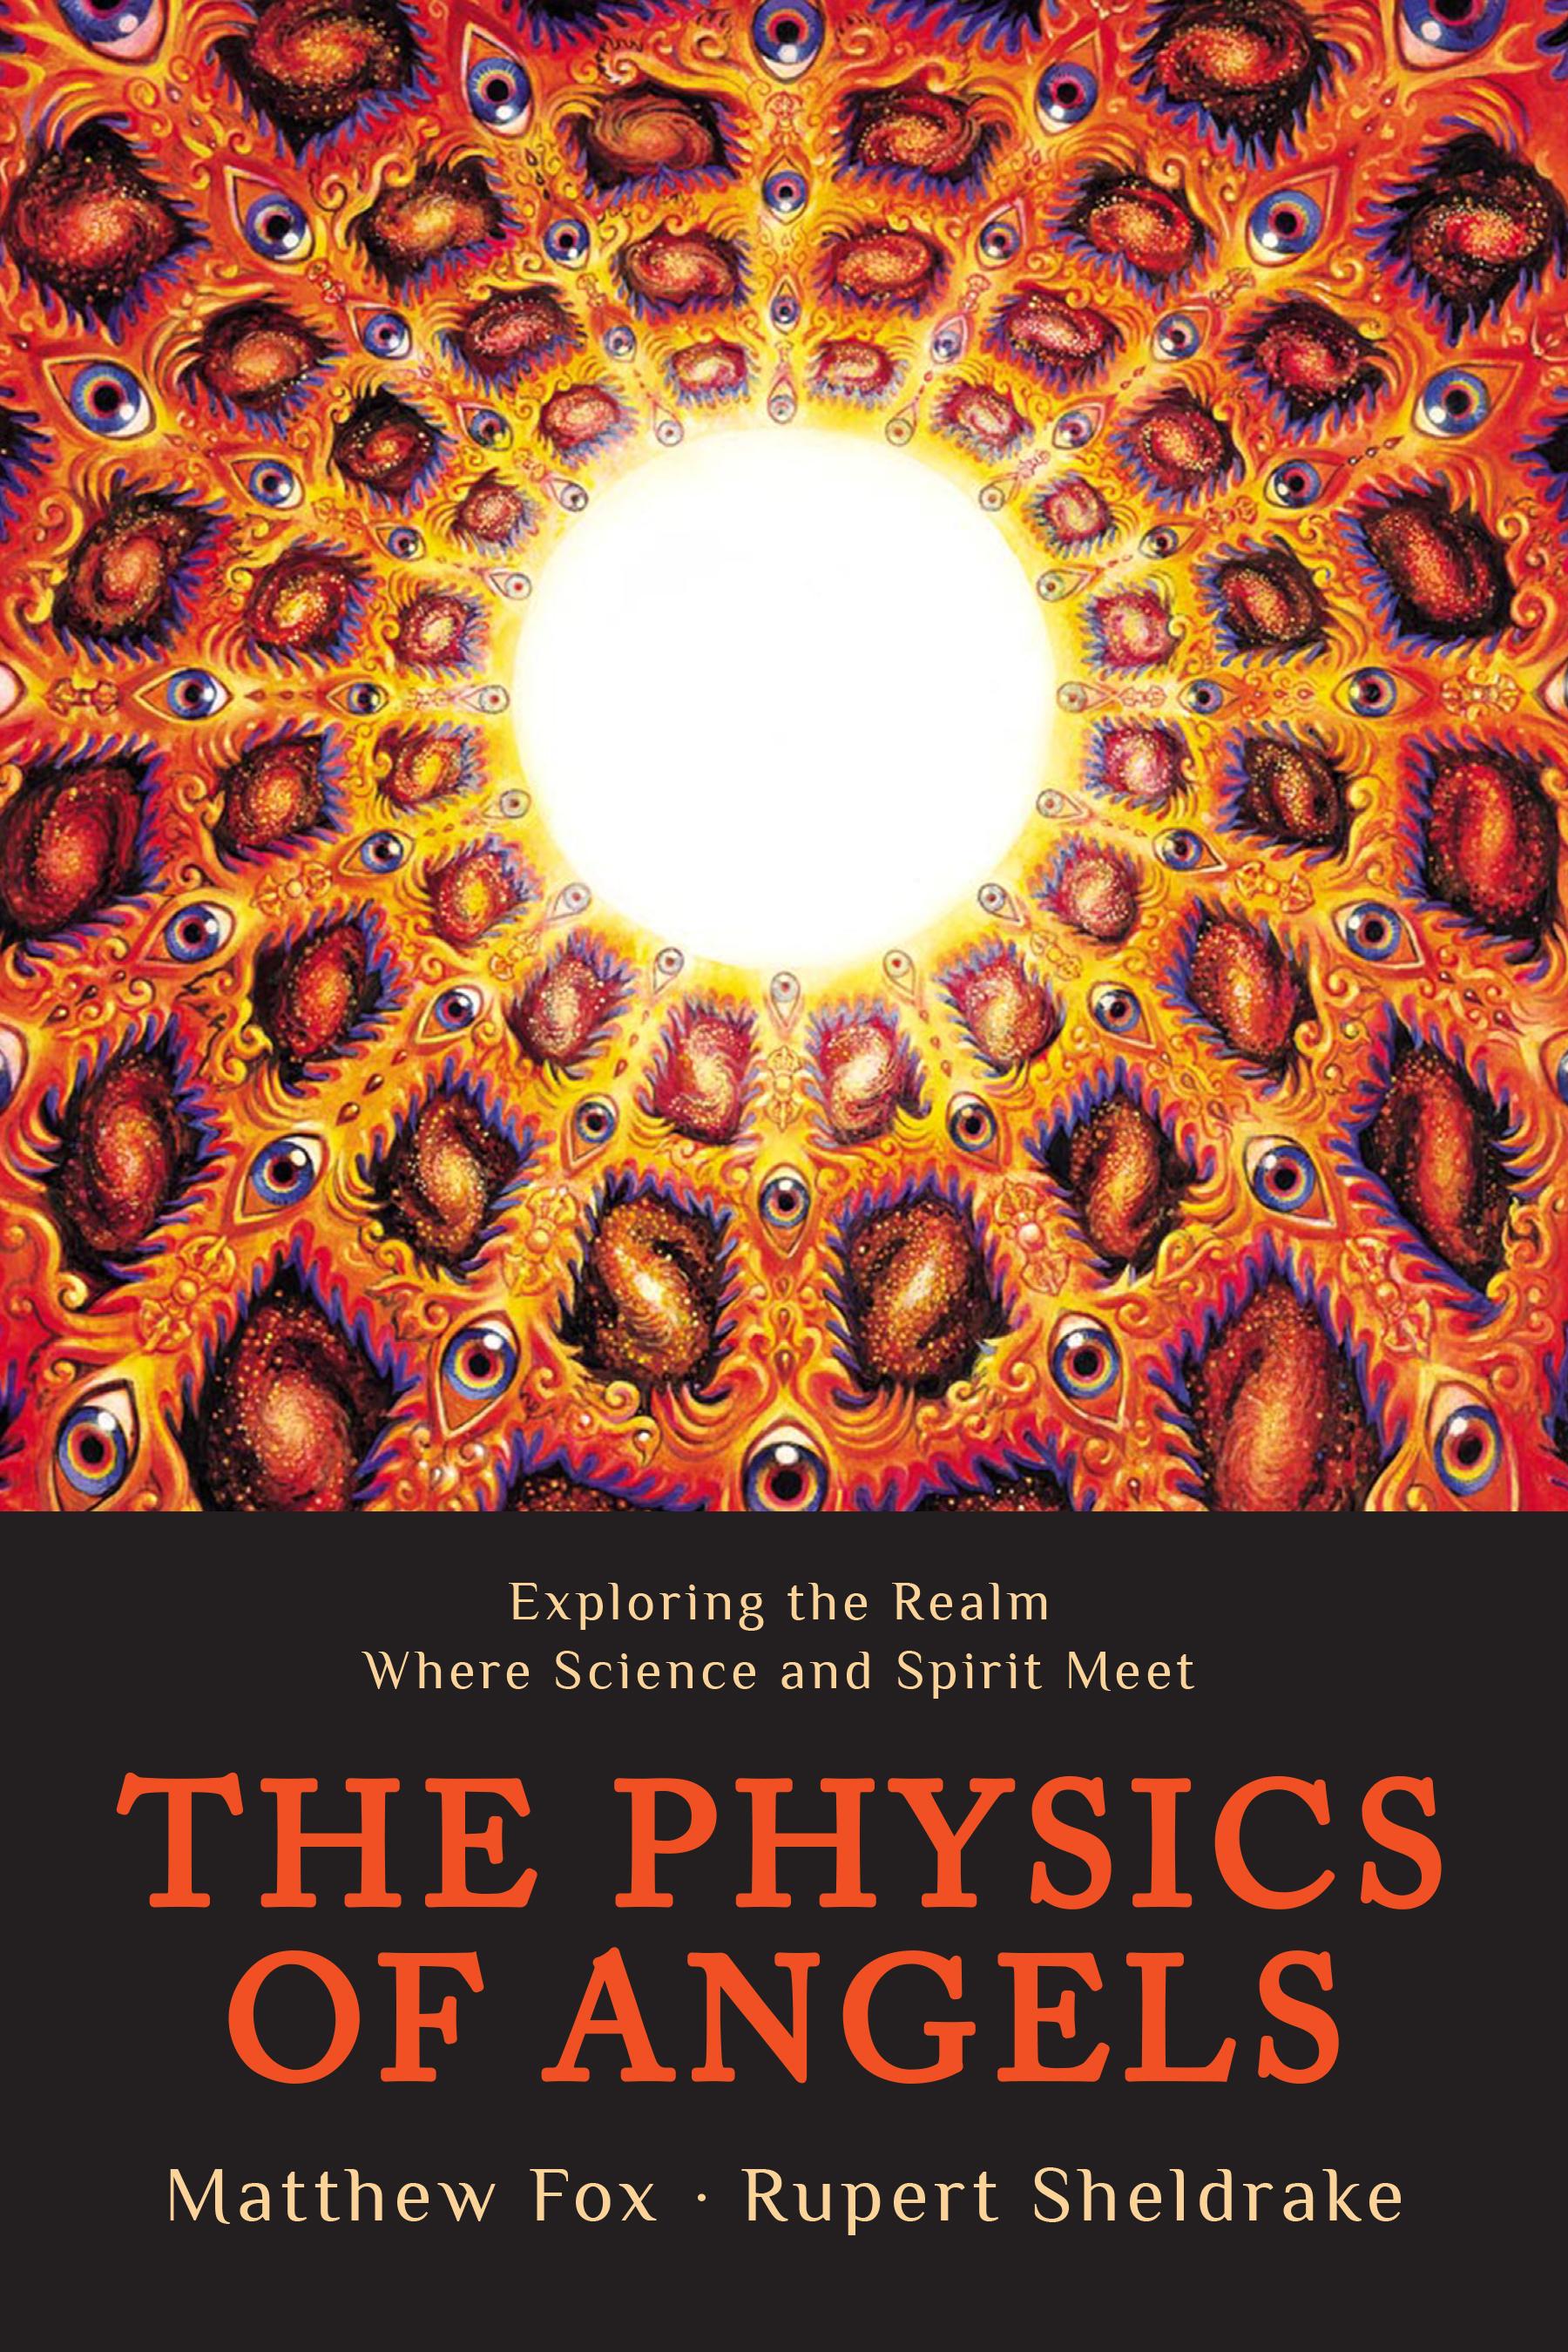 PhysicsOfAngels_FrontCov_HiRes